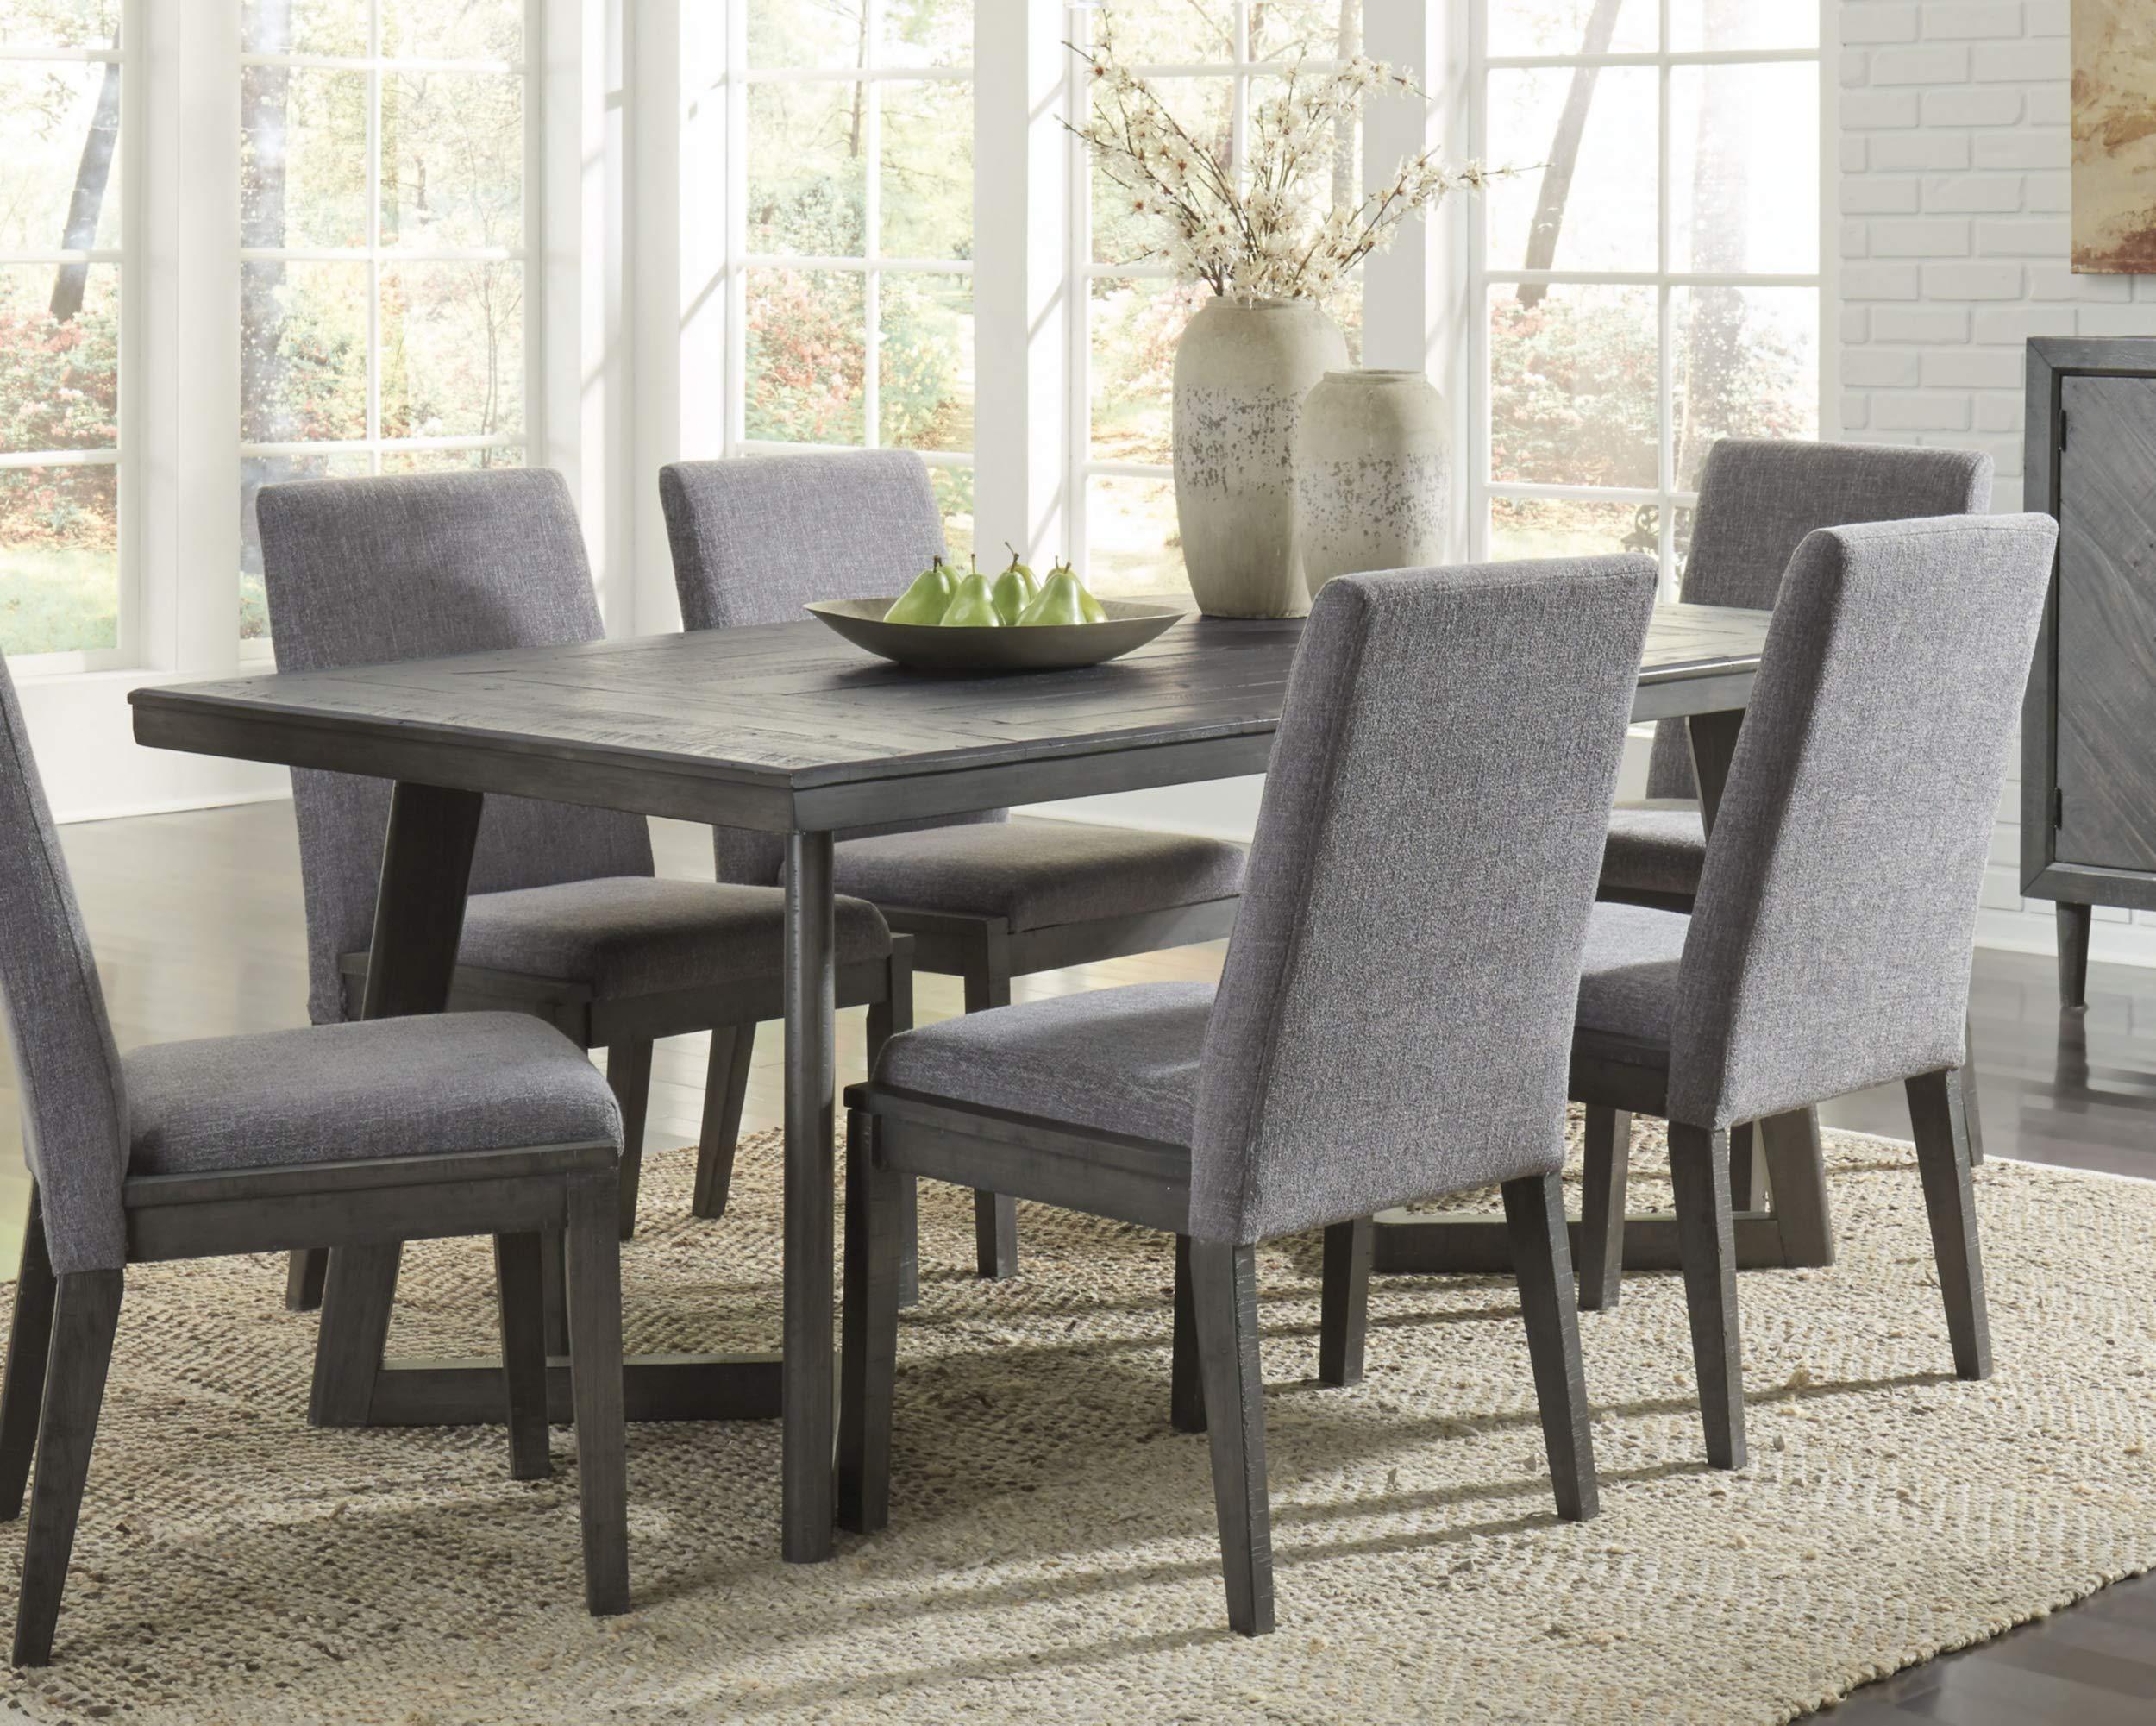 Signature Design by Ashley D568-25 Besteneer Dining Room Table, Dark Gray